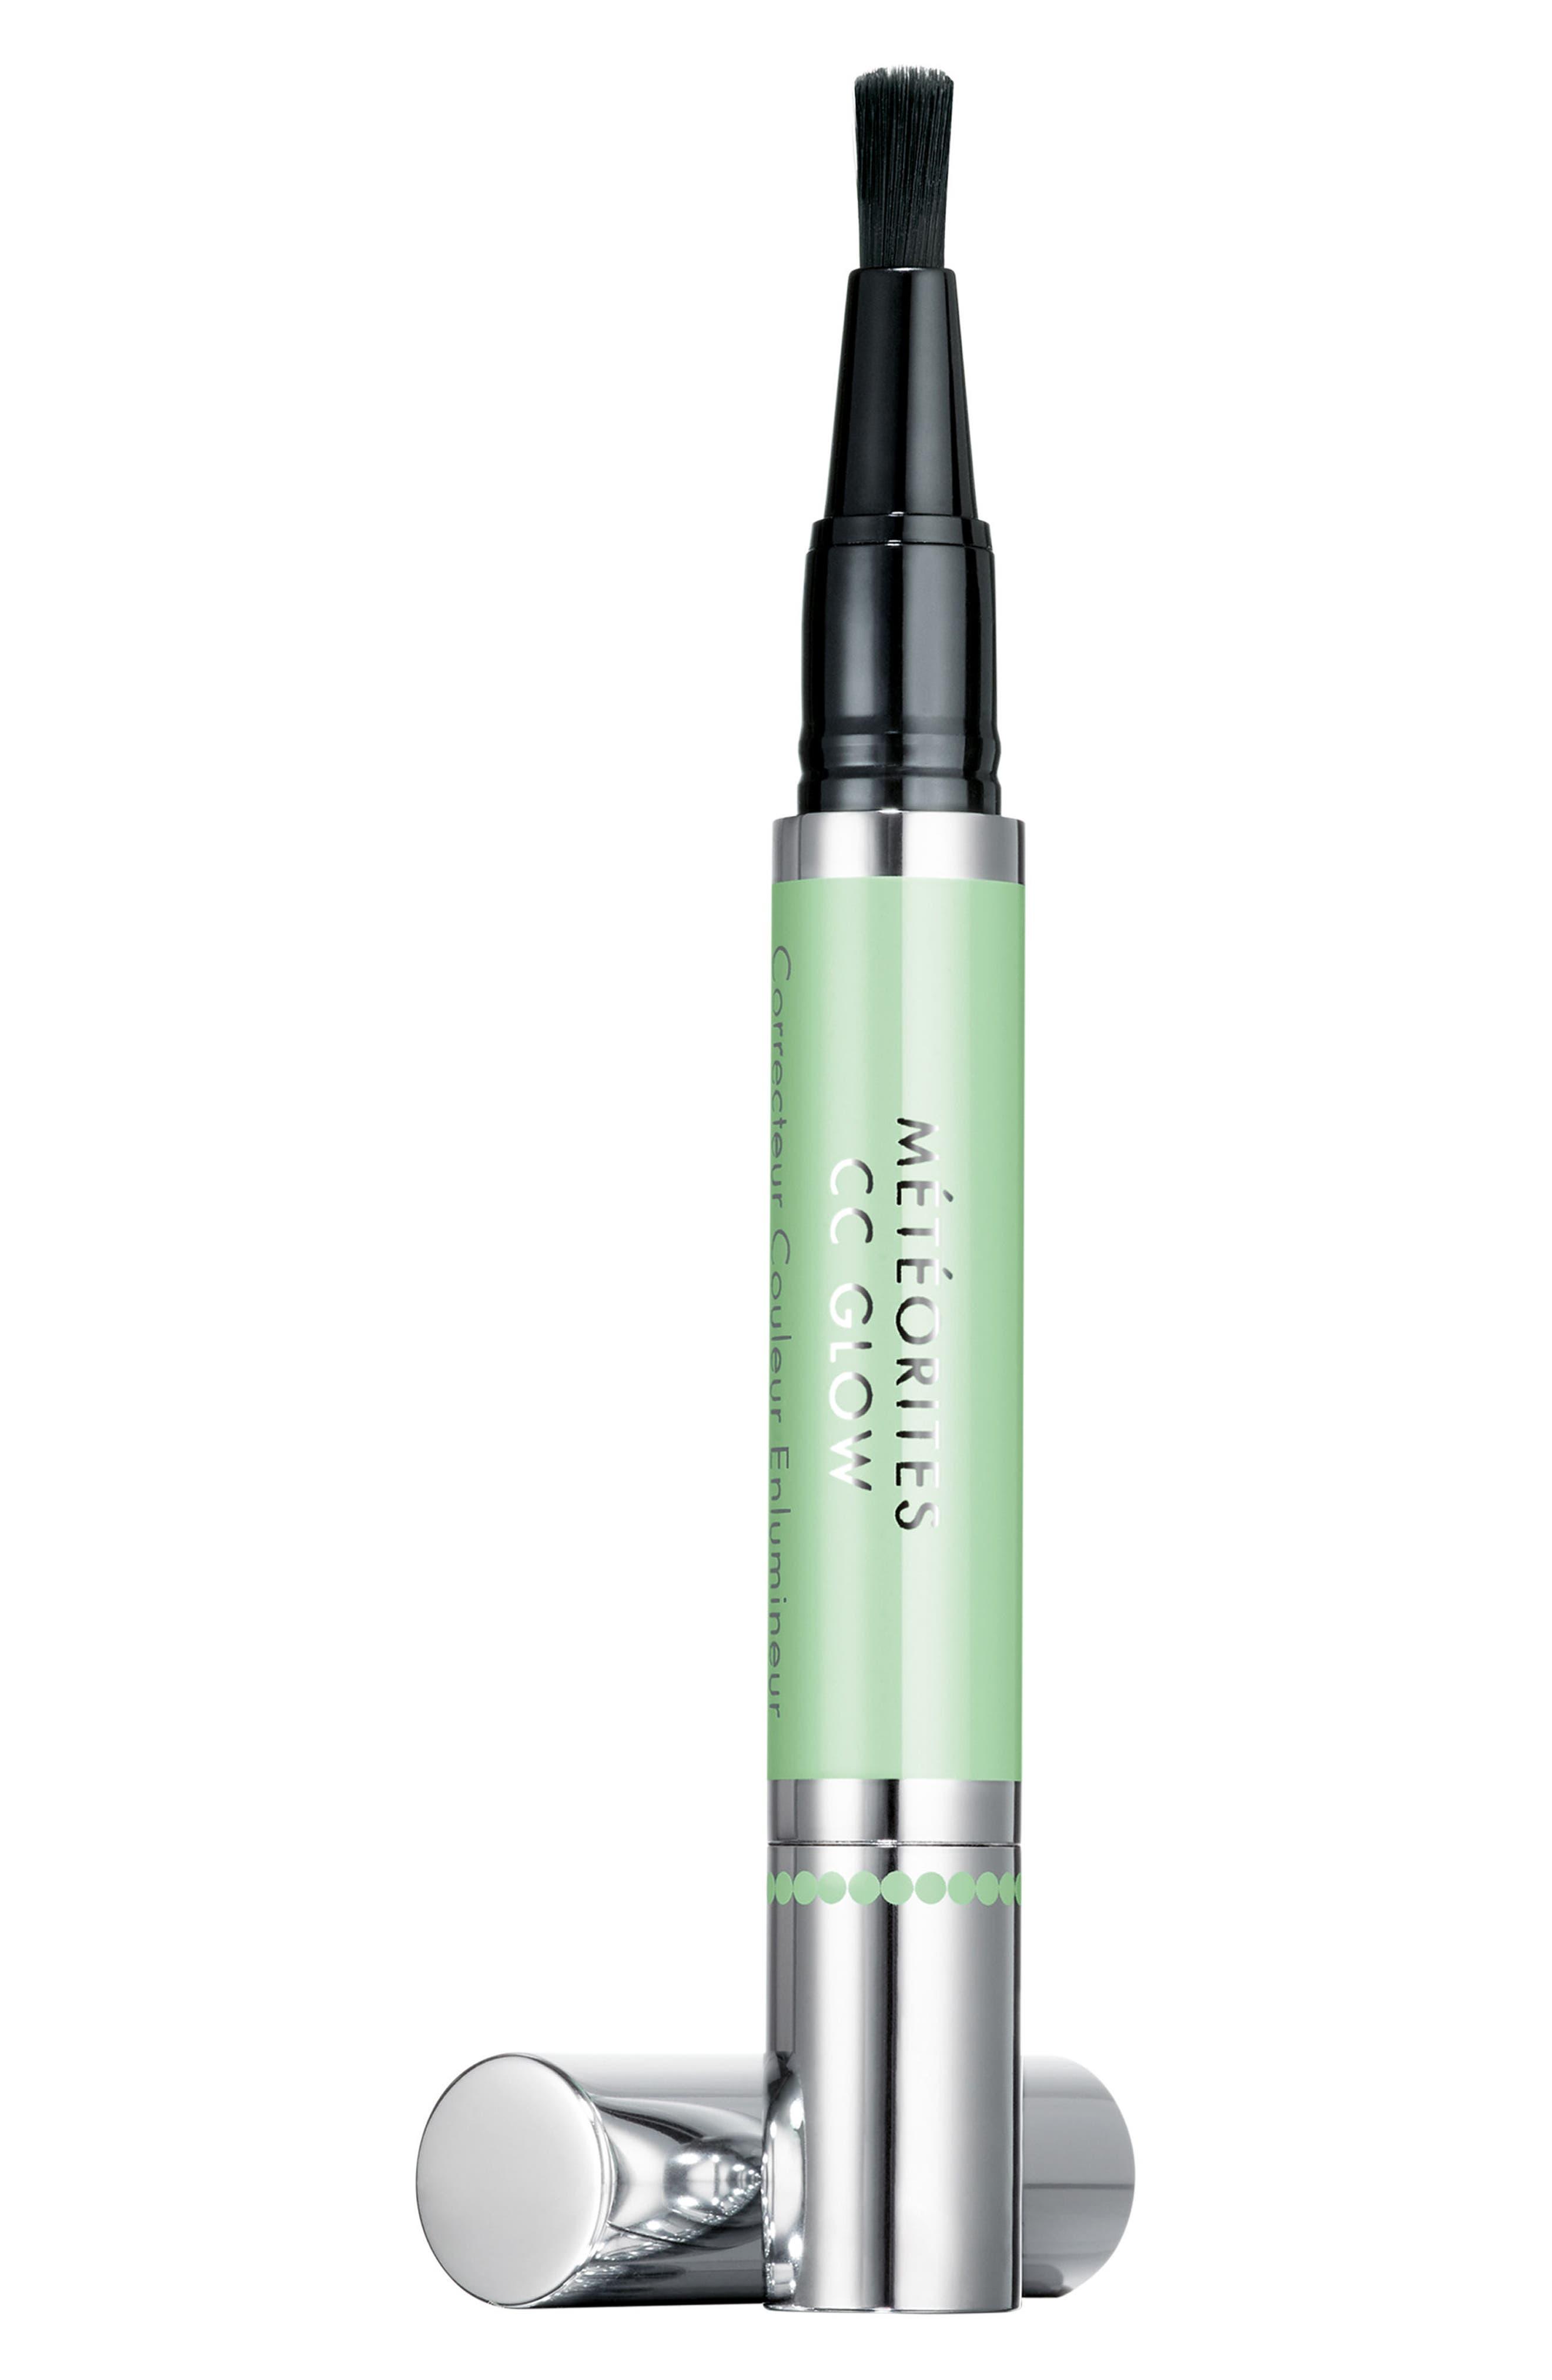 Guerlain Météorites CC Glow Color-Correcting Highlighter